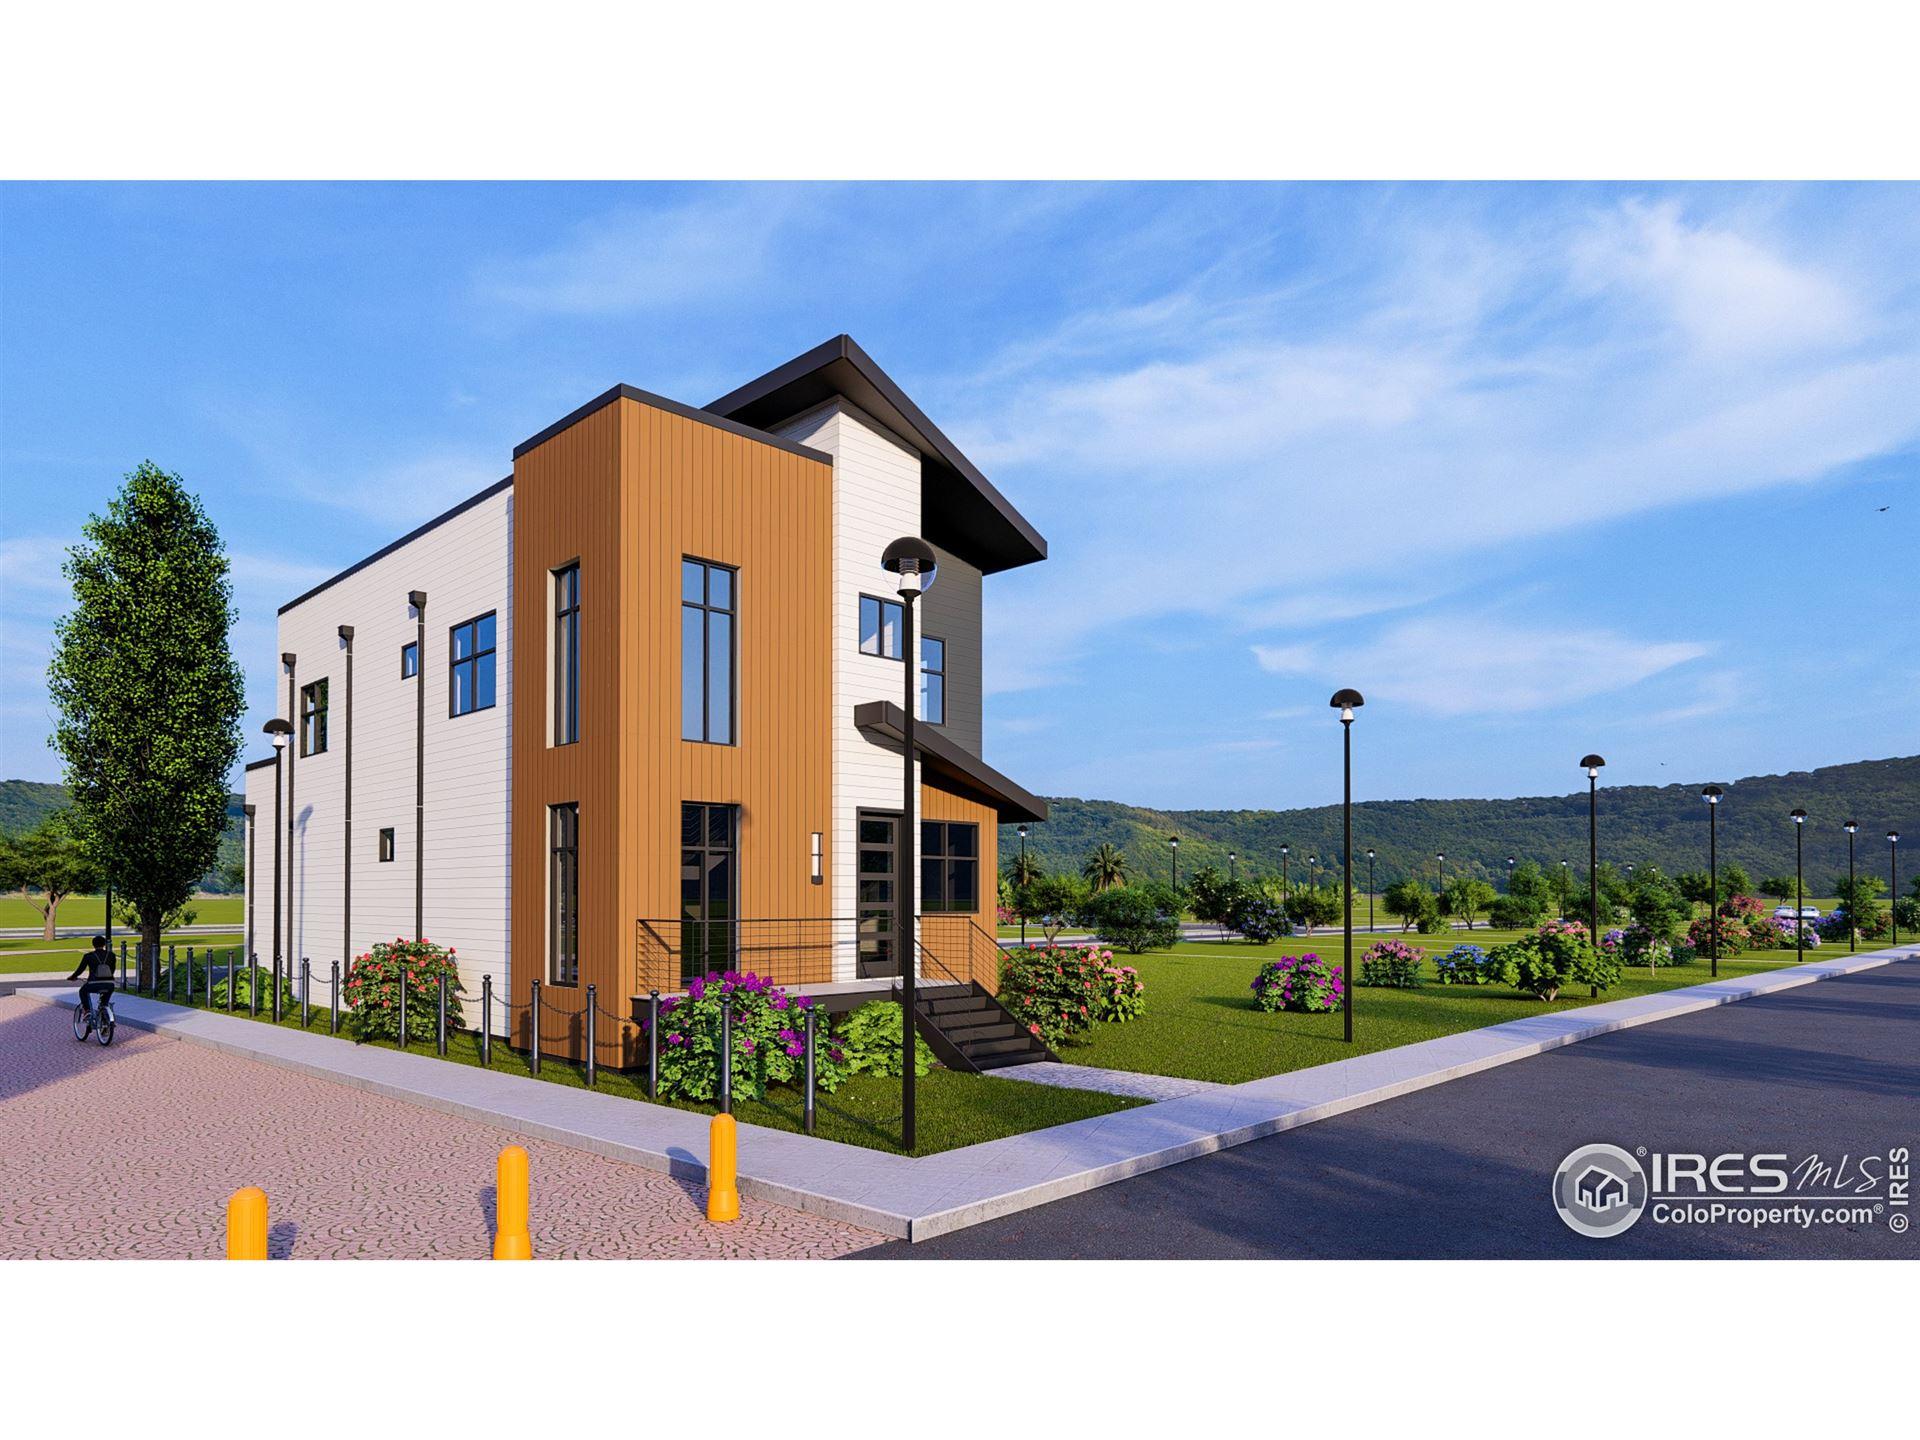 426 Osiander St, Fort Collins, CO 80524 - #: 941402